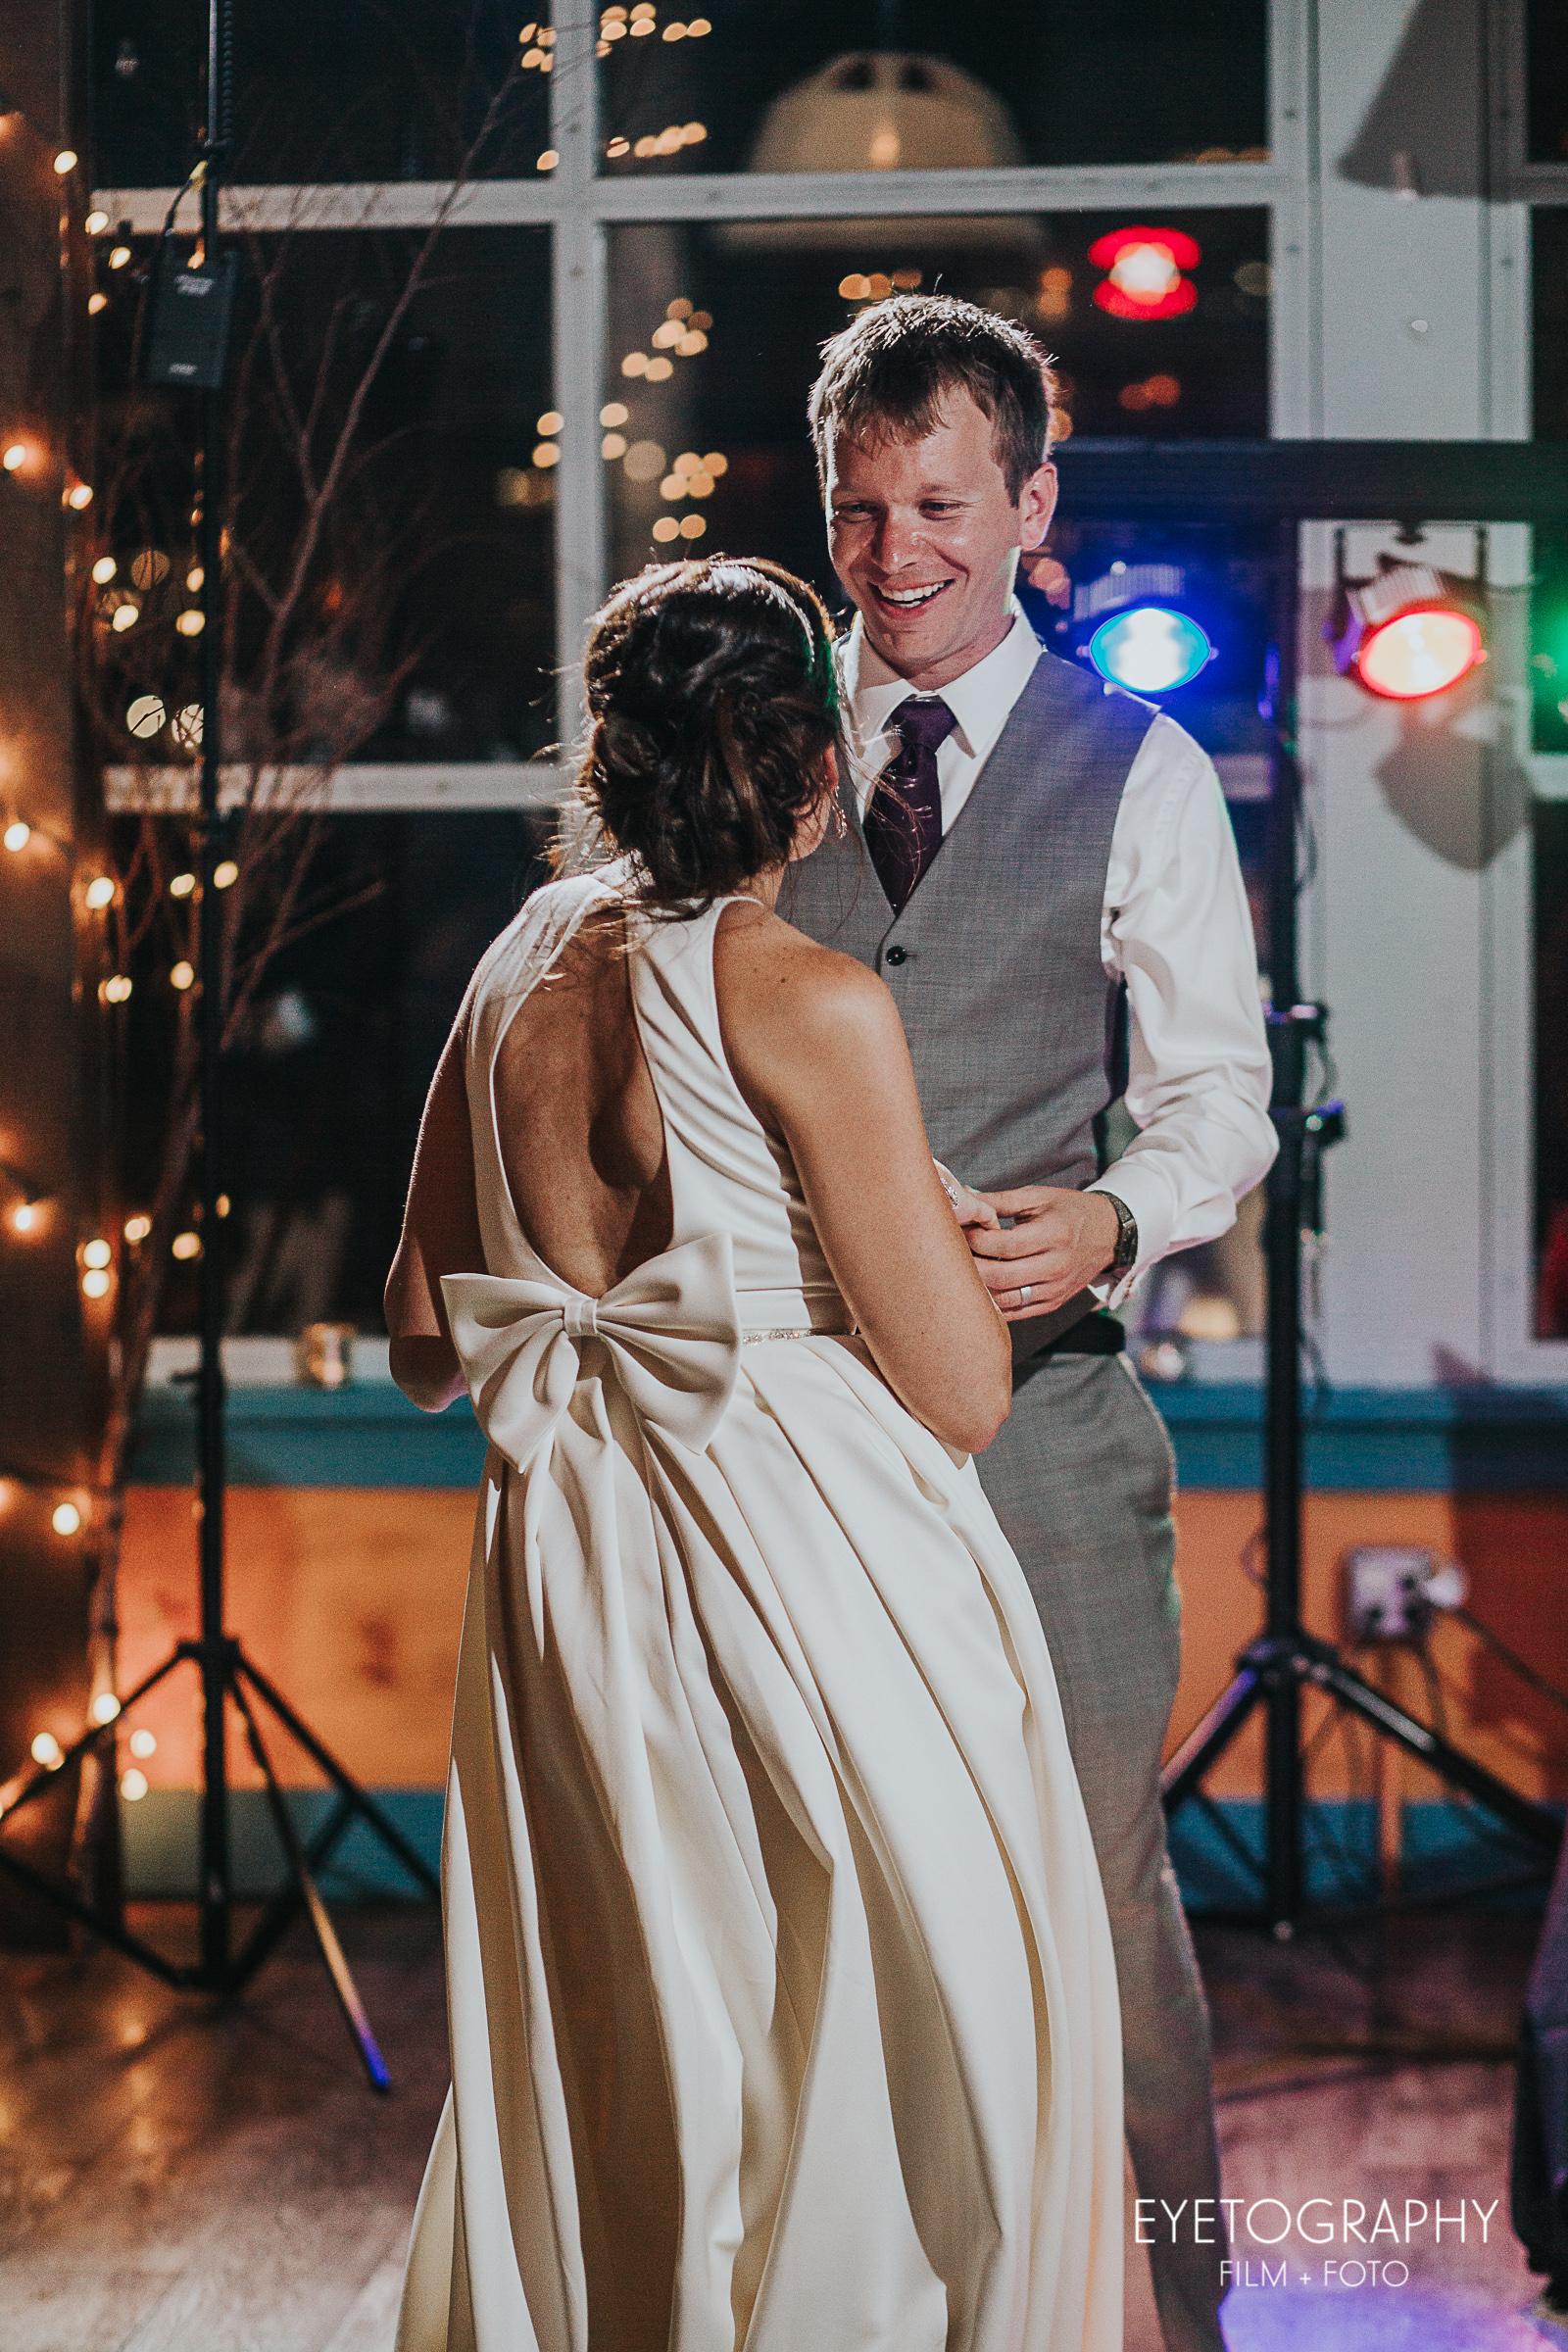 Eyetography Film + Foto - Jaimie and Dan Wedding-1214.jpg